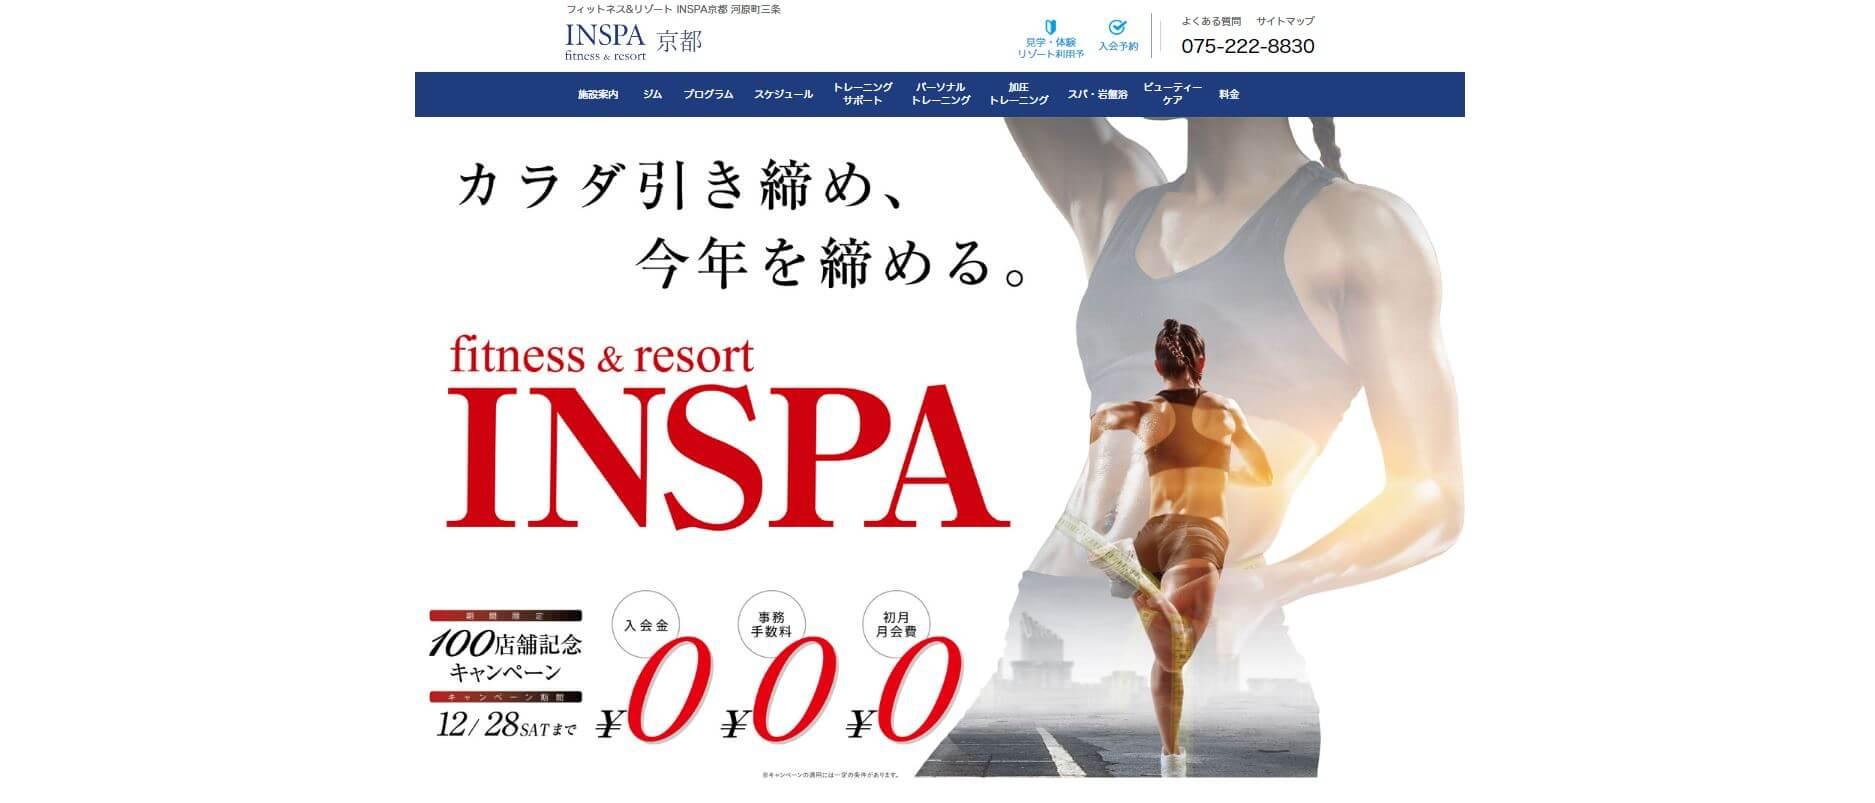 INSPA 京都